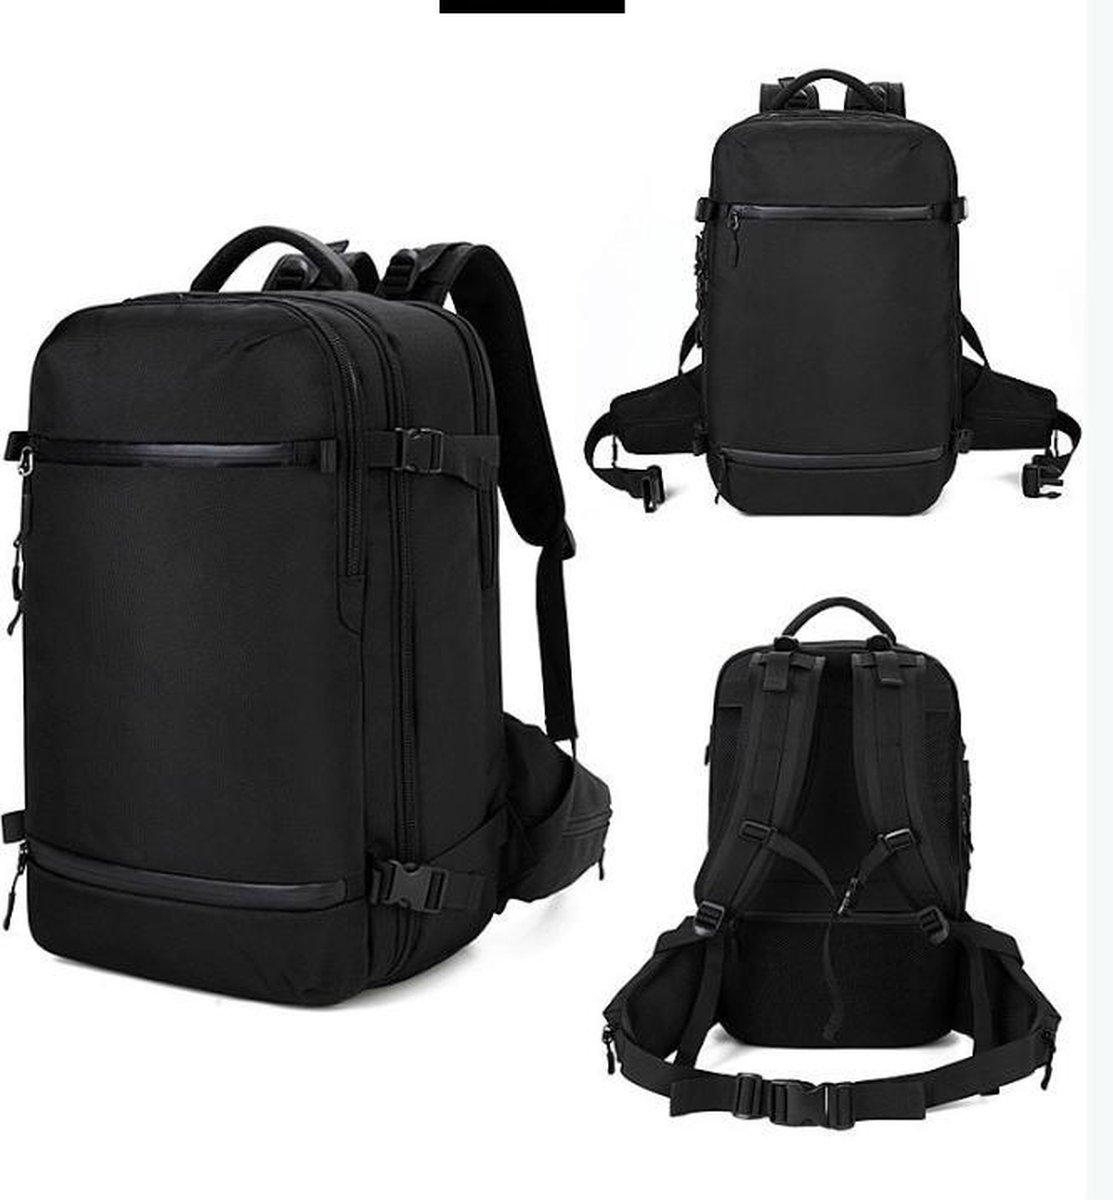 Backpack cabin size black with usb port - Rugzak vliegtuig 51 x 33 x 21 cm - Multifunctioneel en ver